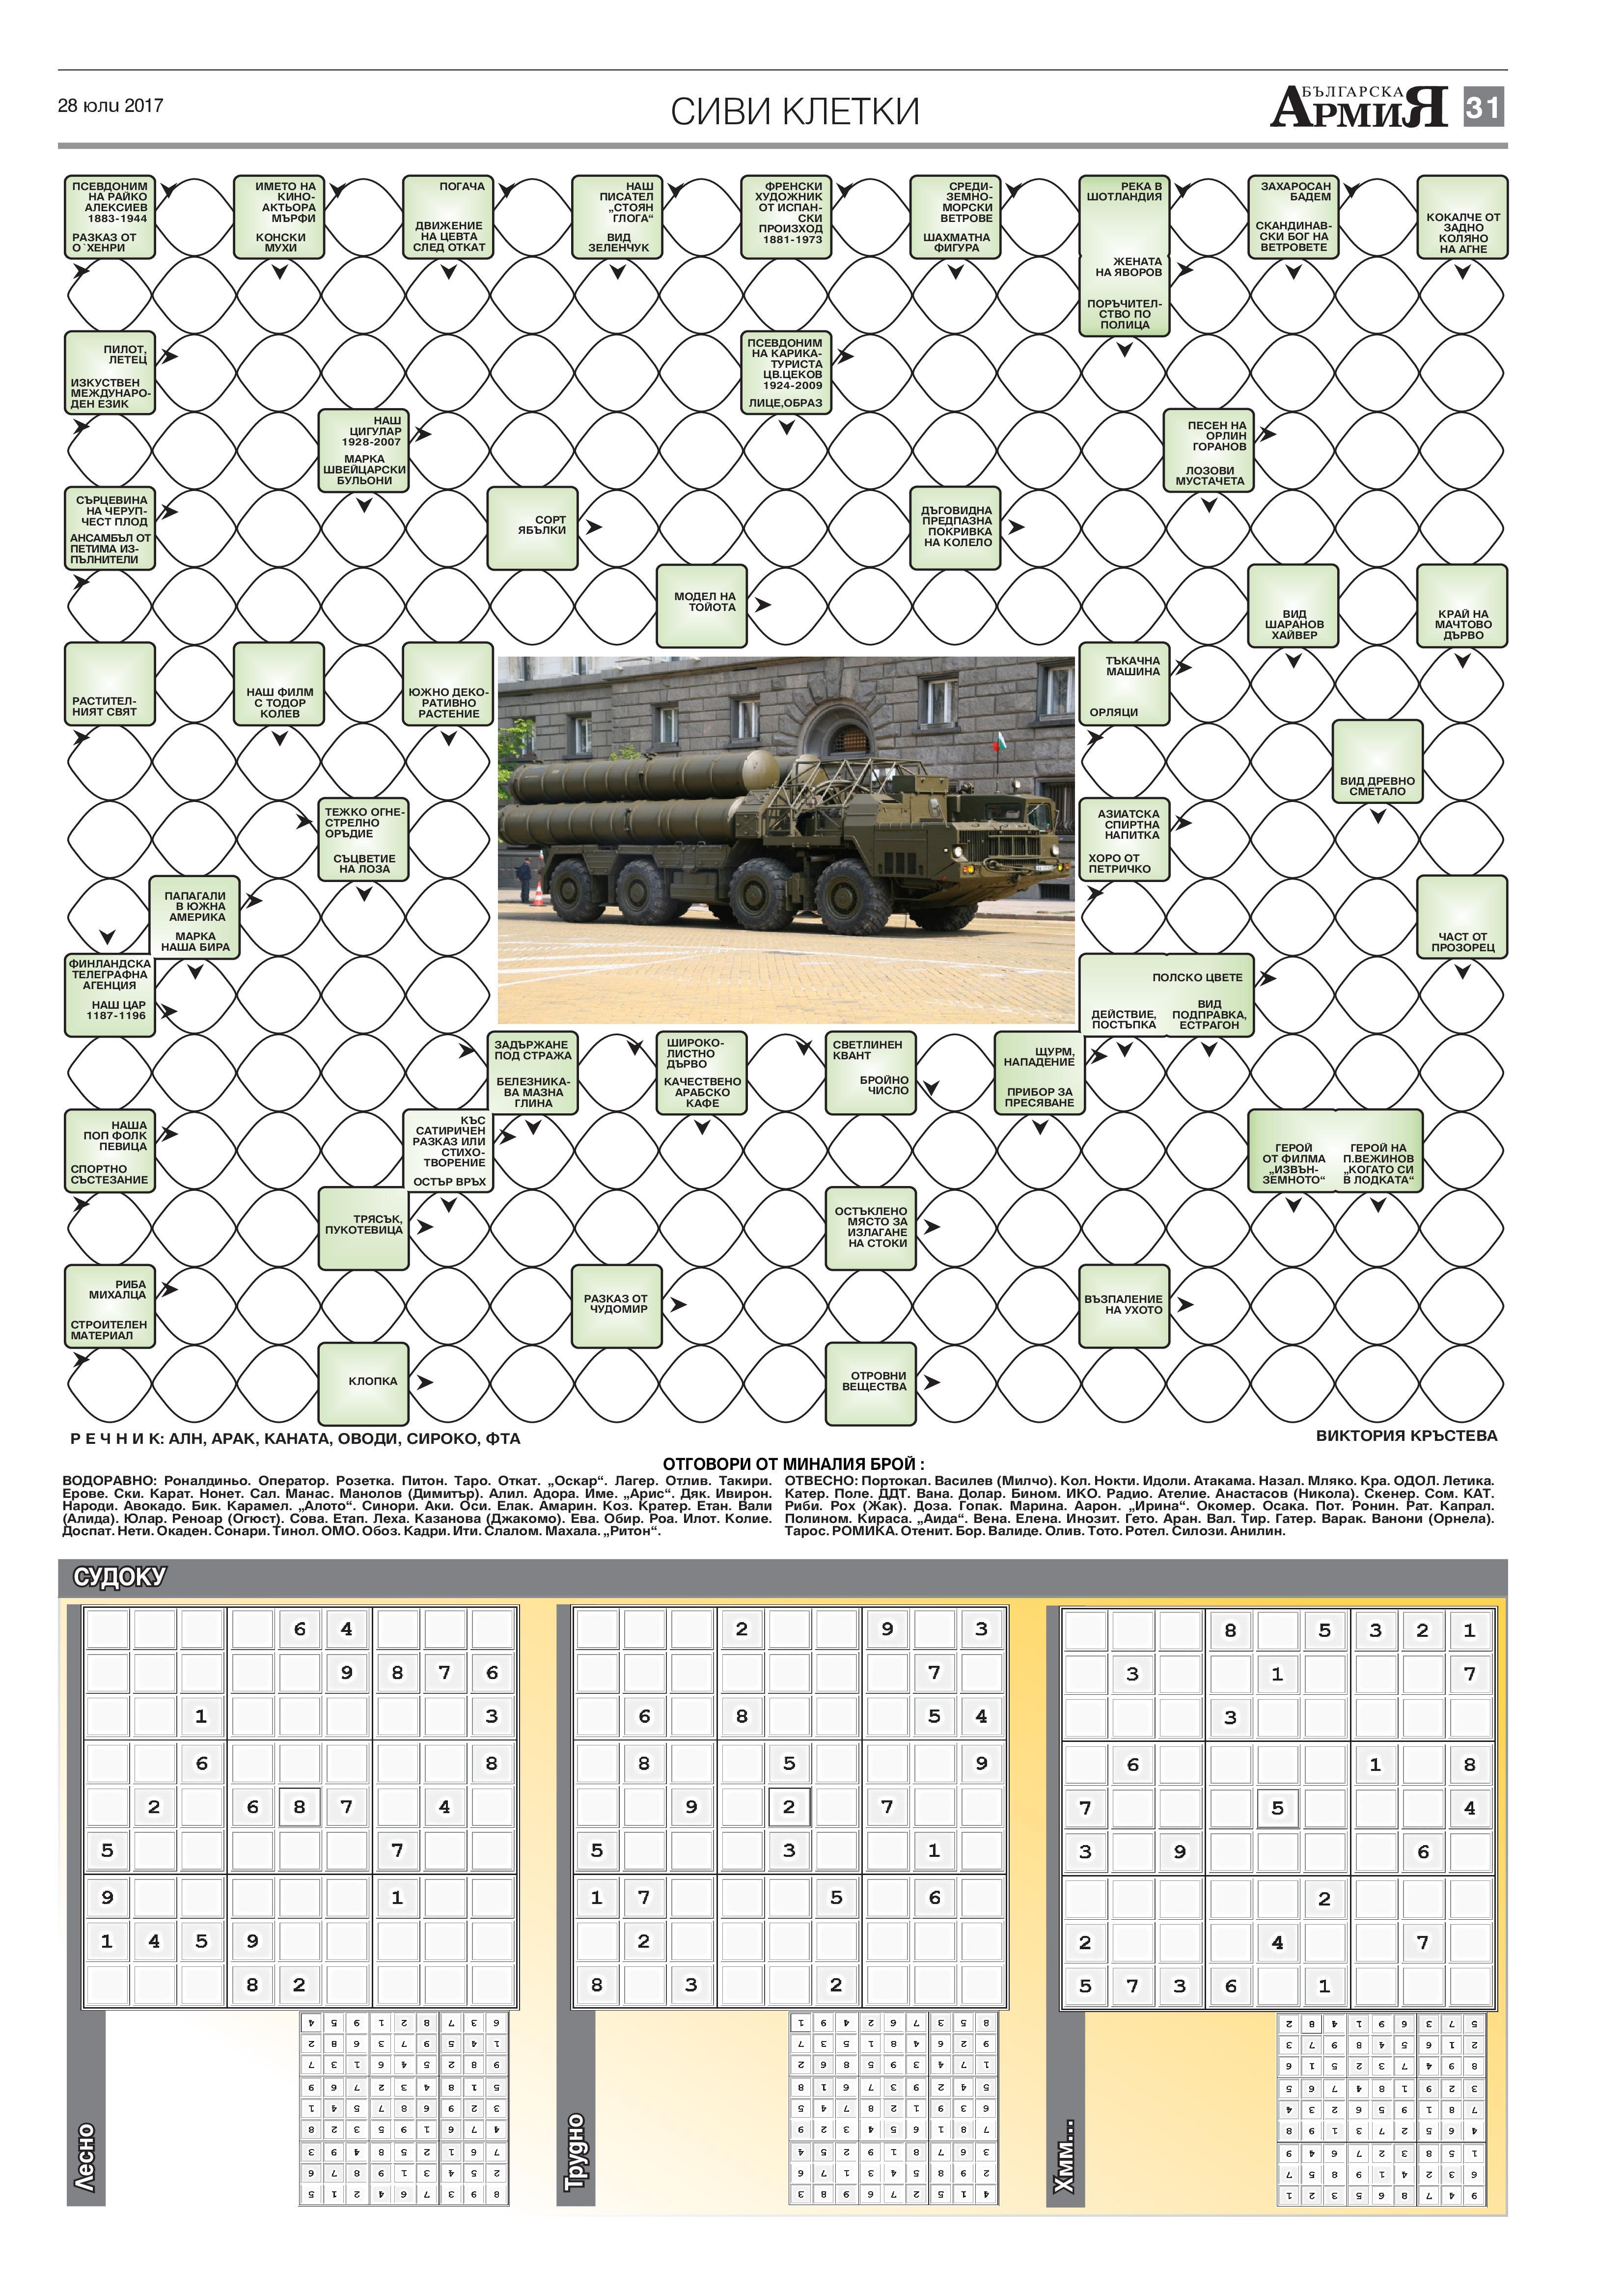 https://www.armymedia.bg/wp-content/uploads/2015/06/31-7.jpg